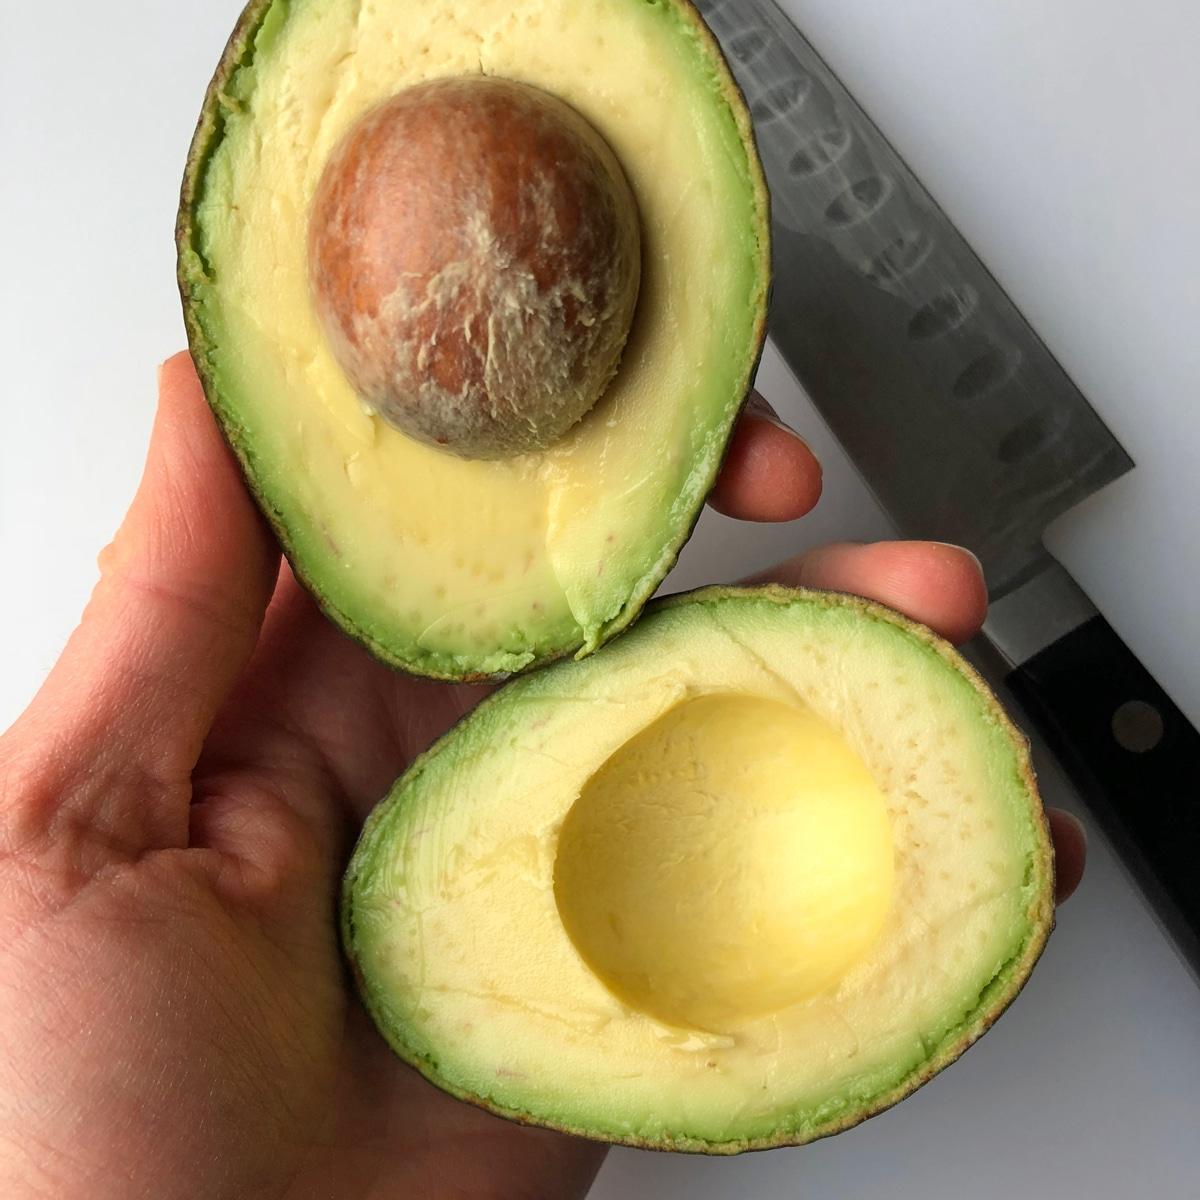 step two - cut avocado in half